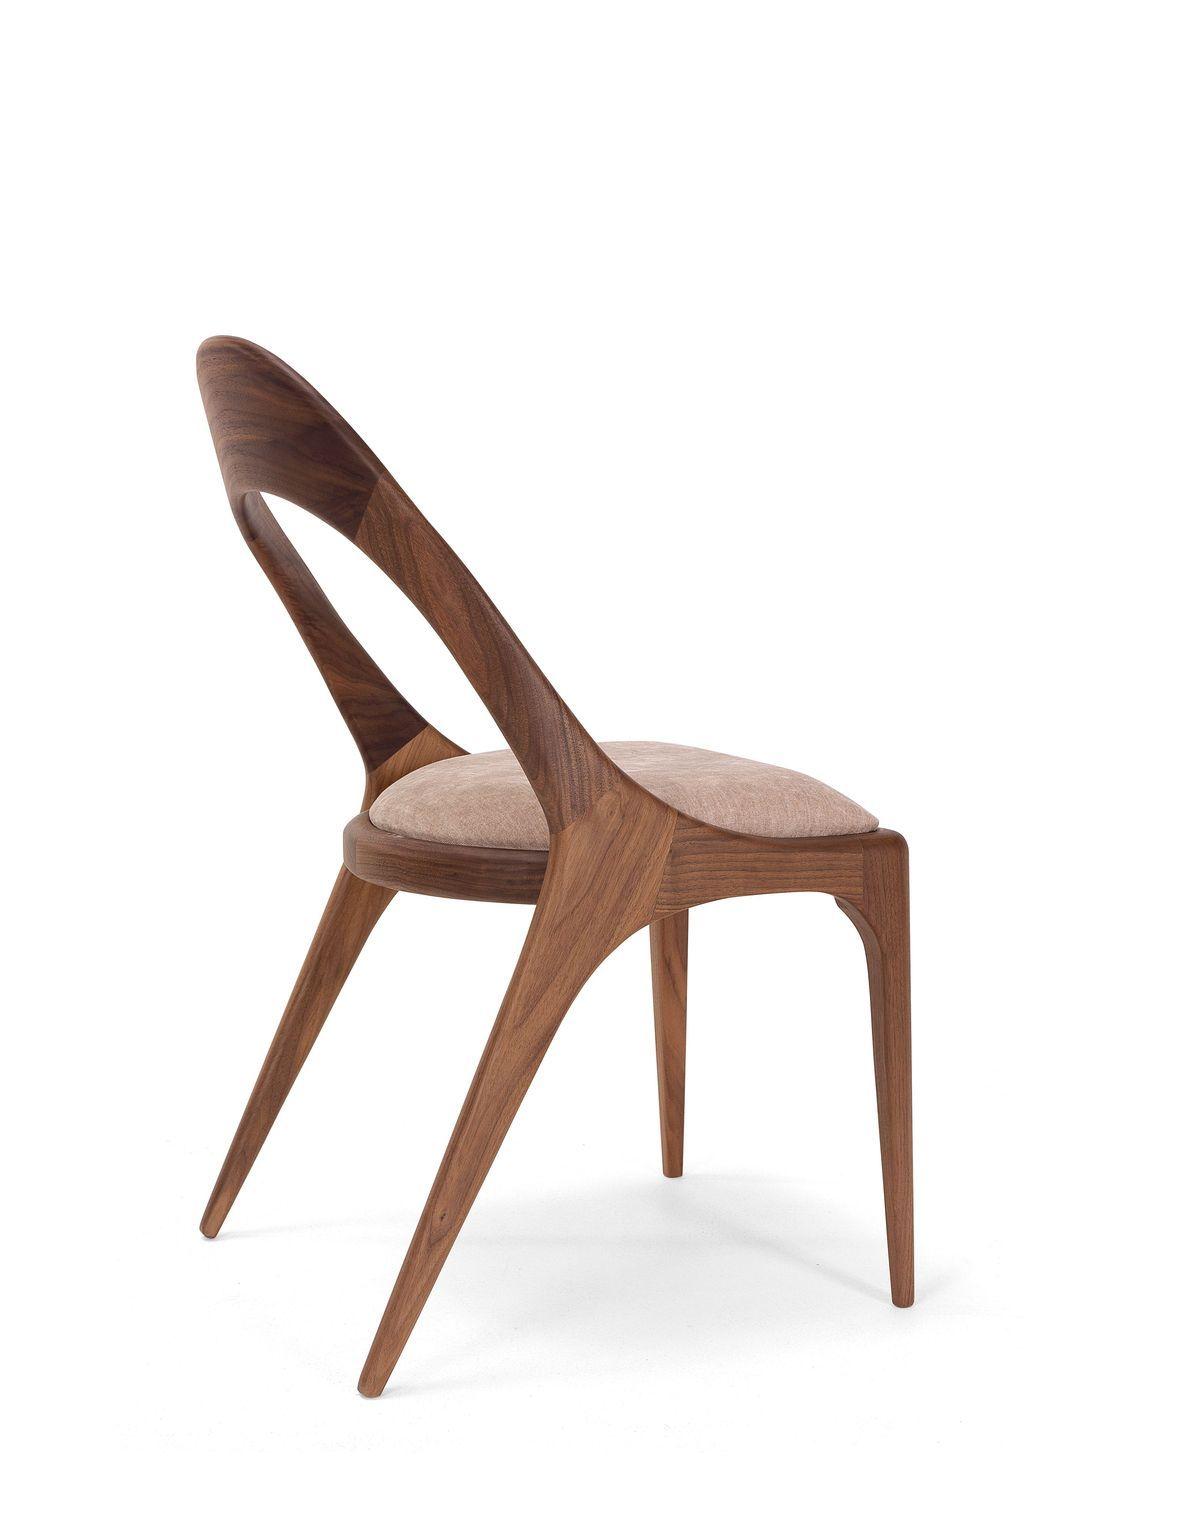 Silla sharon nogal americano sleek furniture pieces by paco camús sharon denise